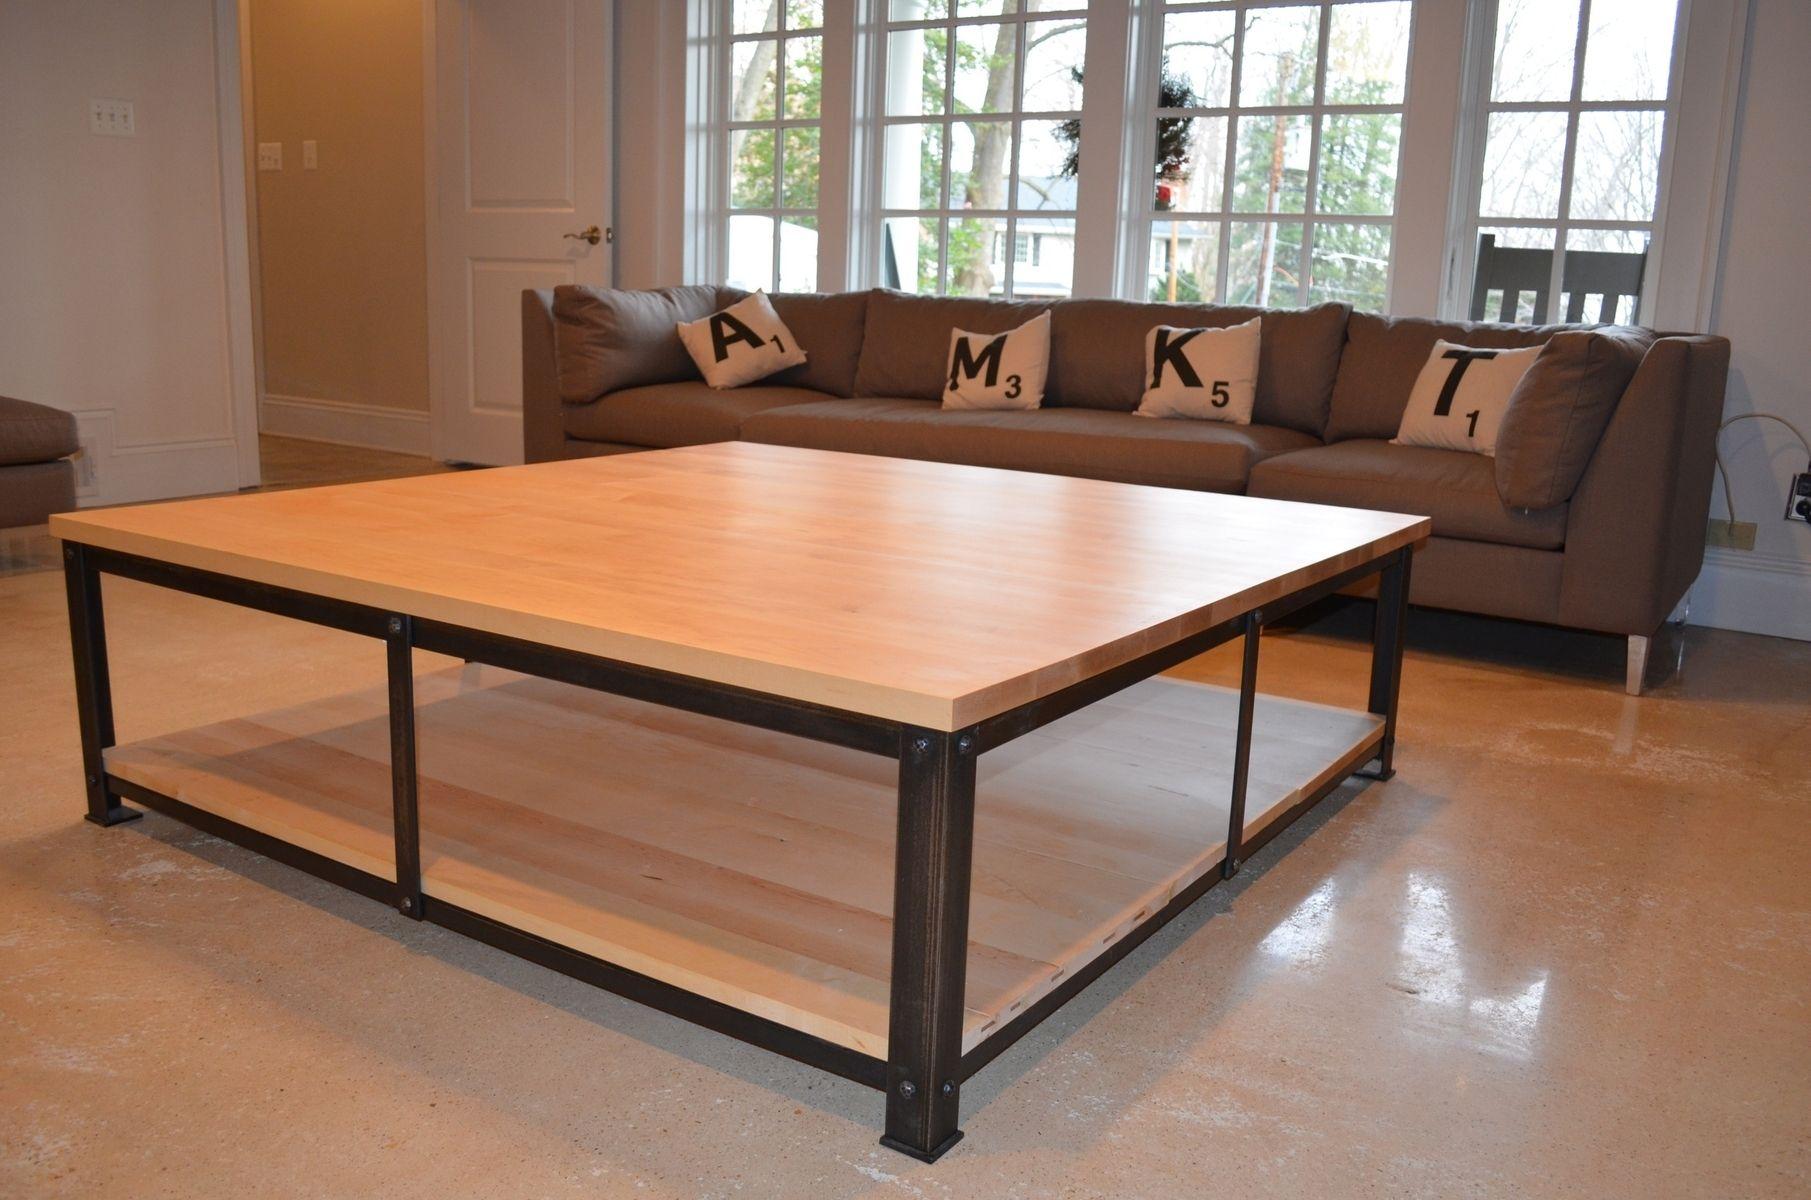 Handmade Square Coffee Table By Kala Studios Custommade Com